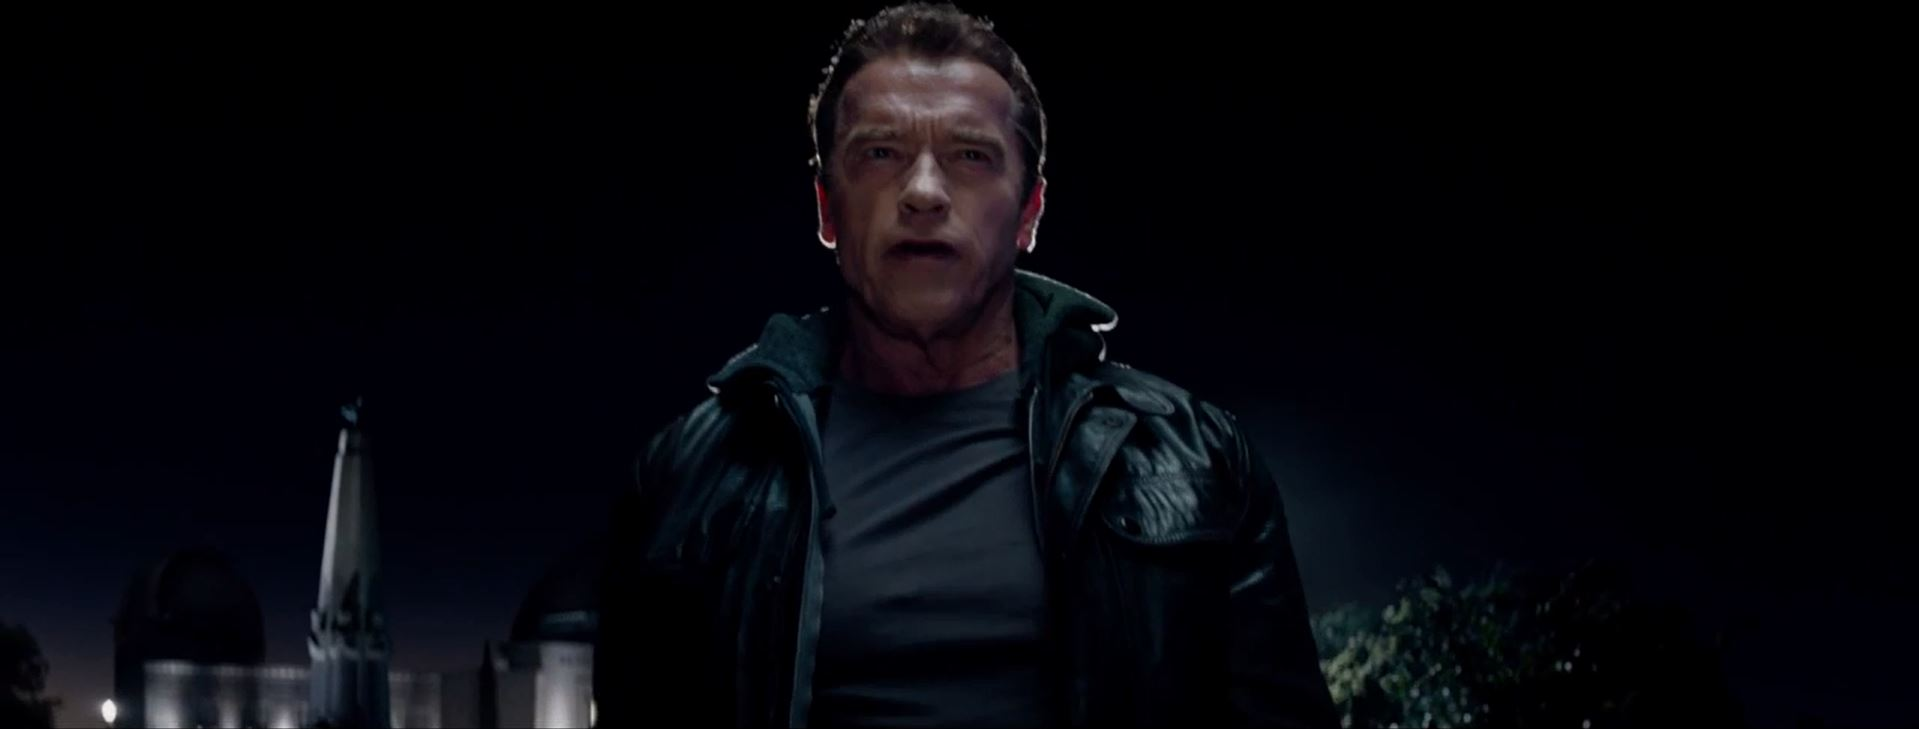 Terminator Genisys aged Arnold Schwarzenegger as the Terminator